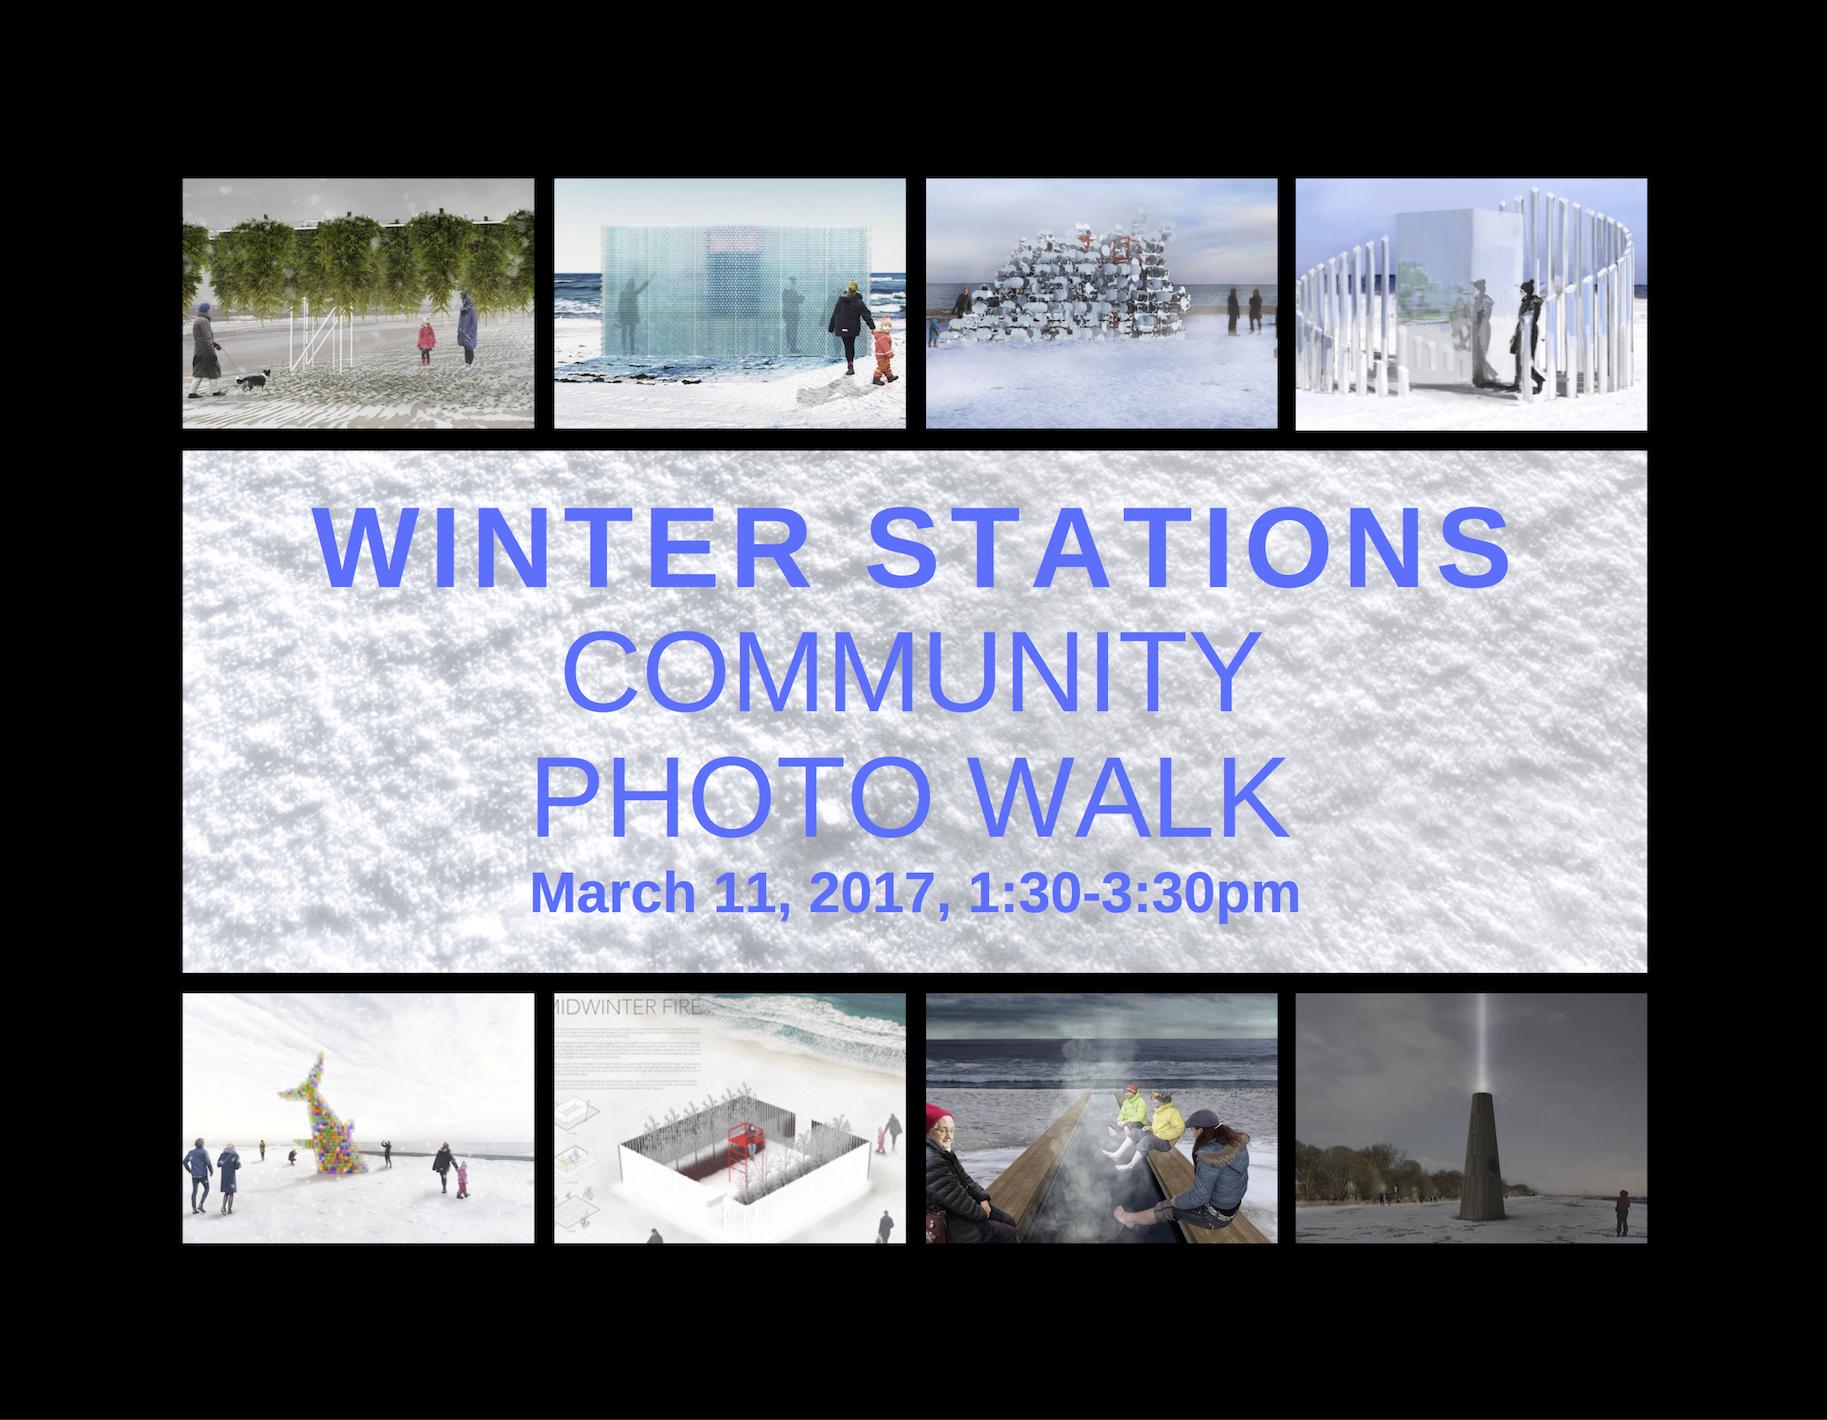 Winter Stations Community Photo Walk